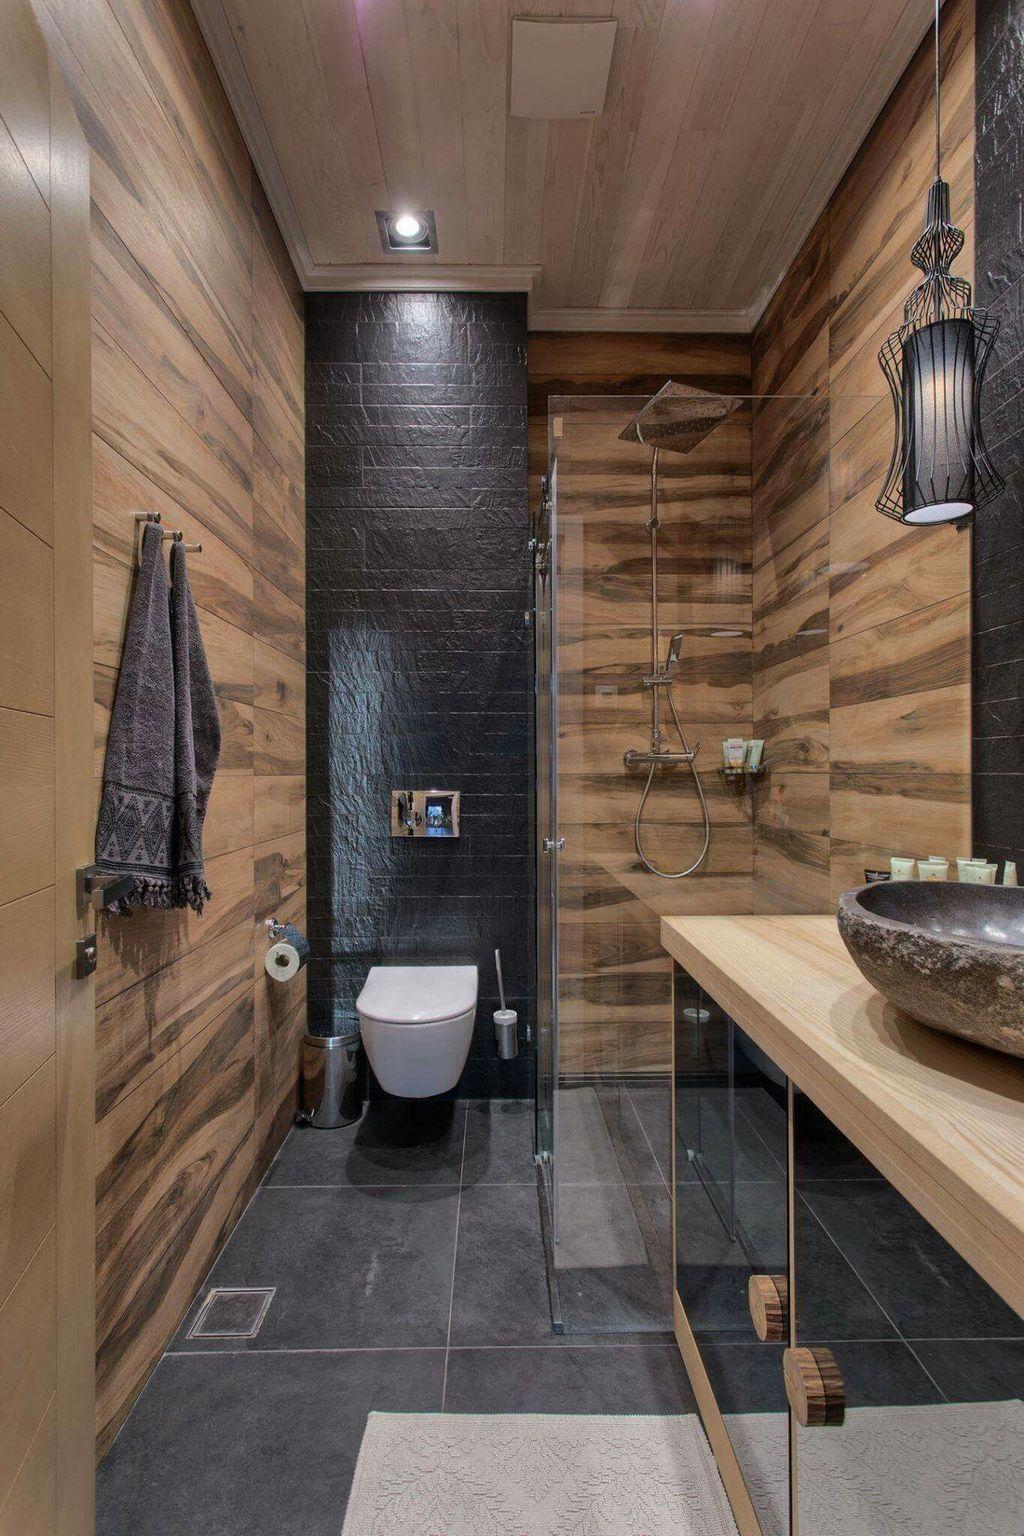 30+ Superb Bathroom Design Ideas With Wood Shades